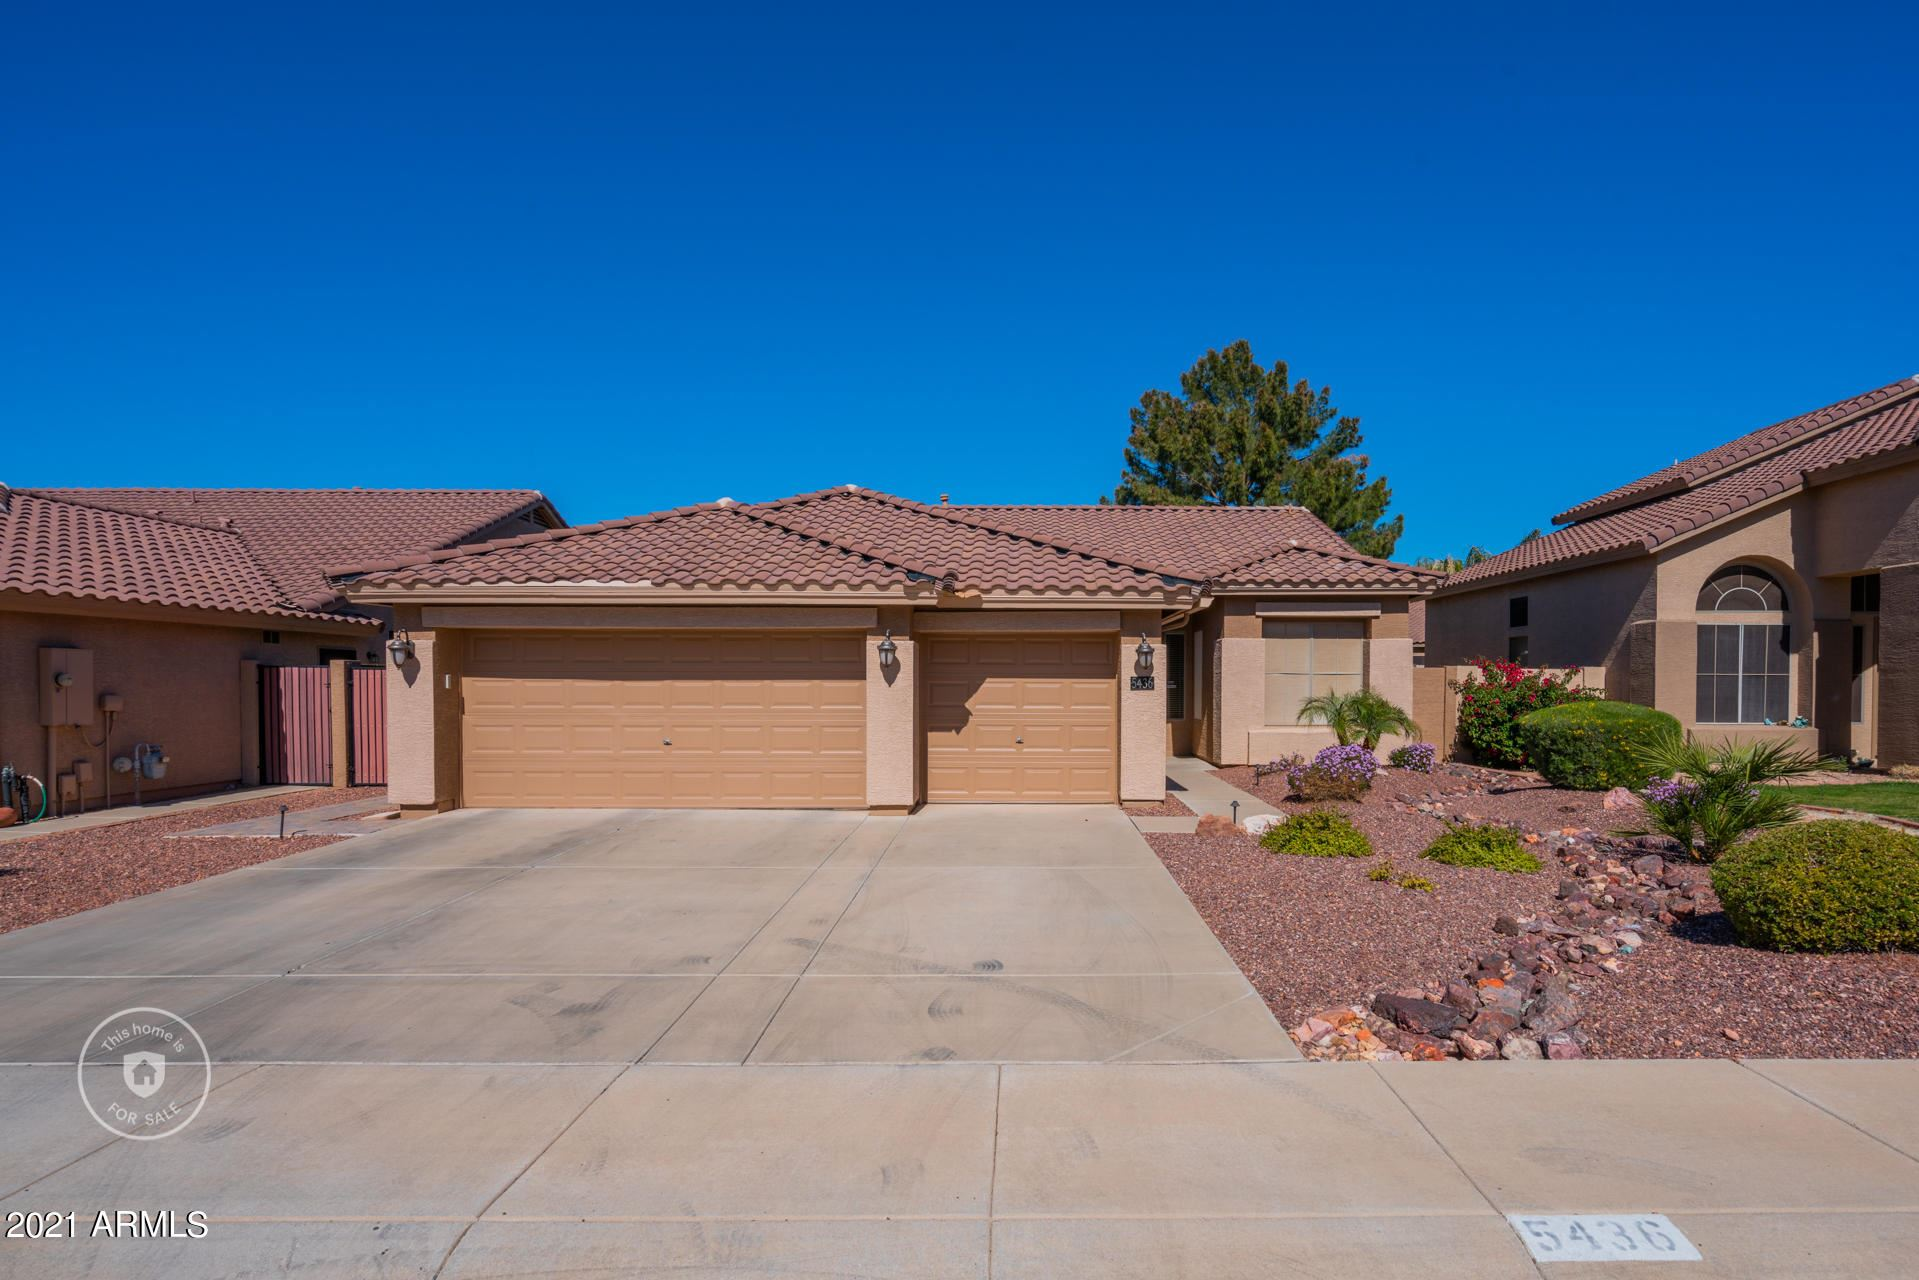 5436 W GREENBRIAR Drive, Glendale, AZ 85308 - MLS#: 6198079